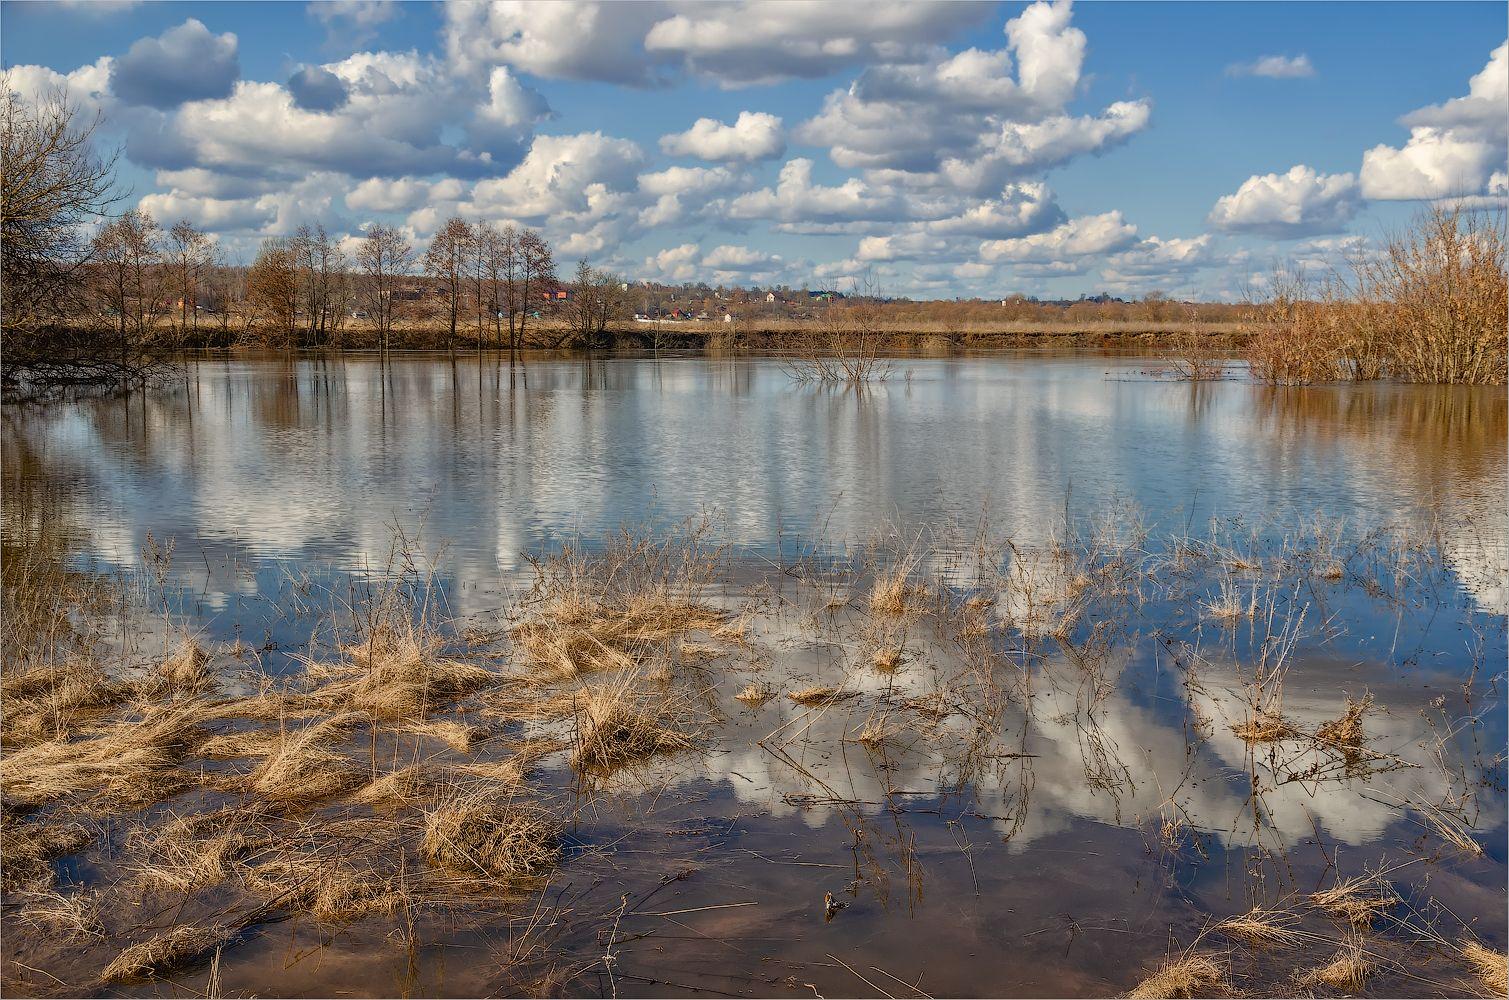 Разлив реки Жиздры пейзаж весна разлив река Жиздра